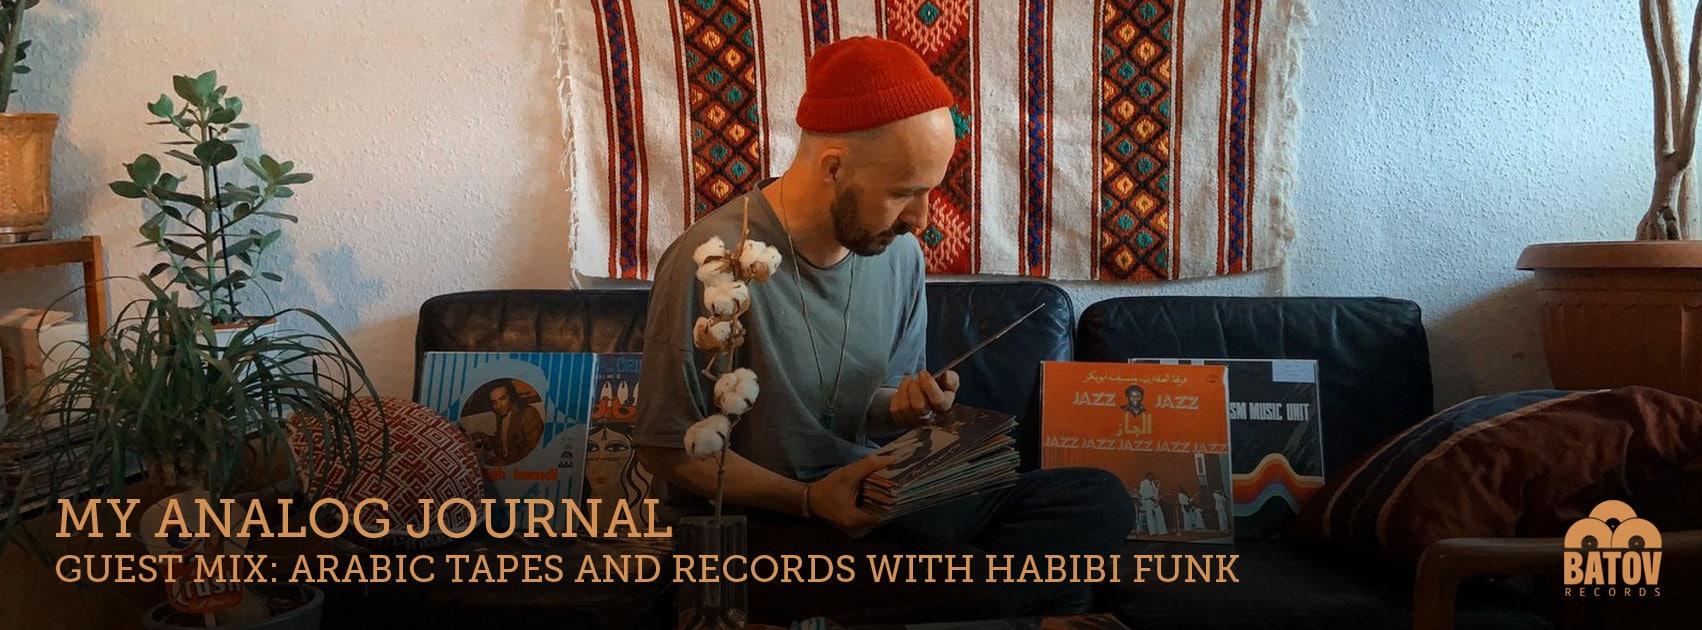 habibi funk My Analog Journal